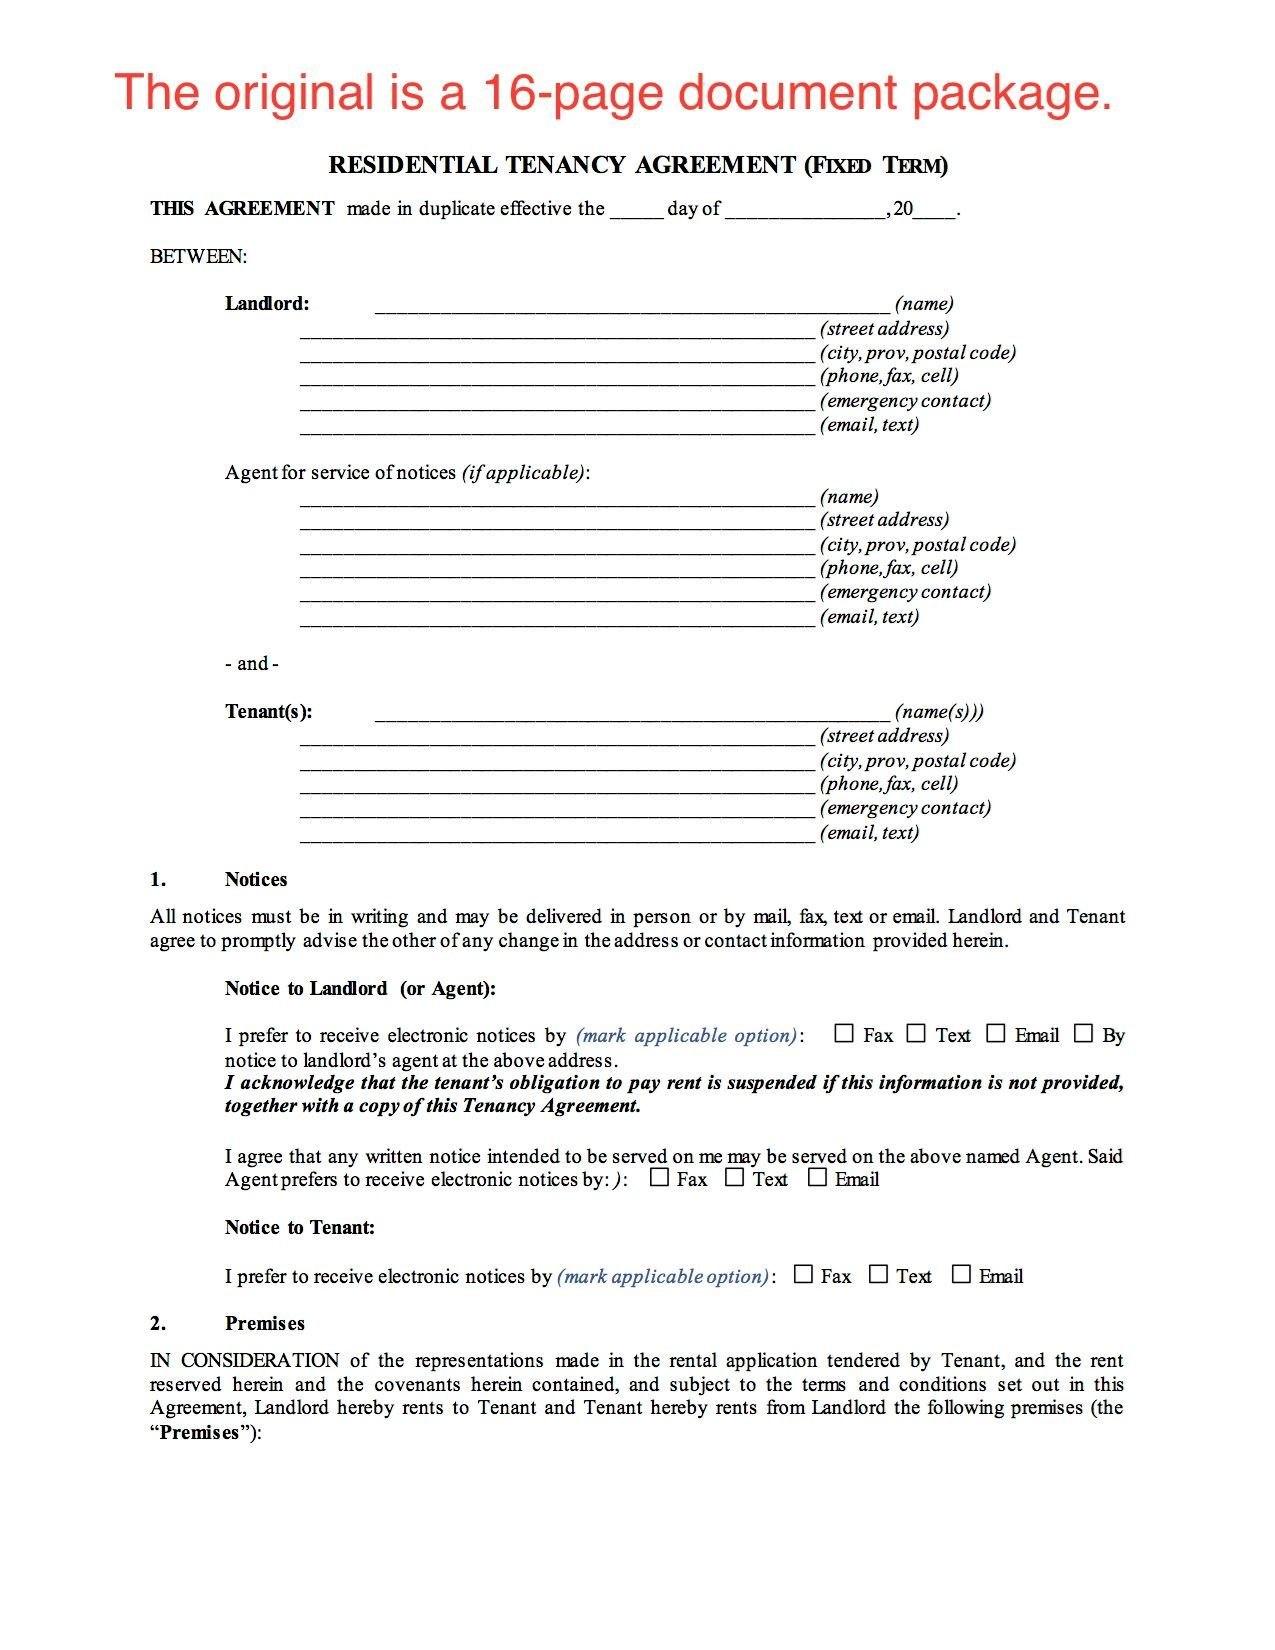 Saskatchewan Residential Fixed Term Lease Or Tenancy Agreement With Fixed Term Tenancy Agreement Template